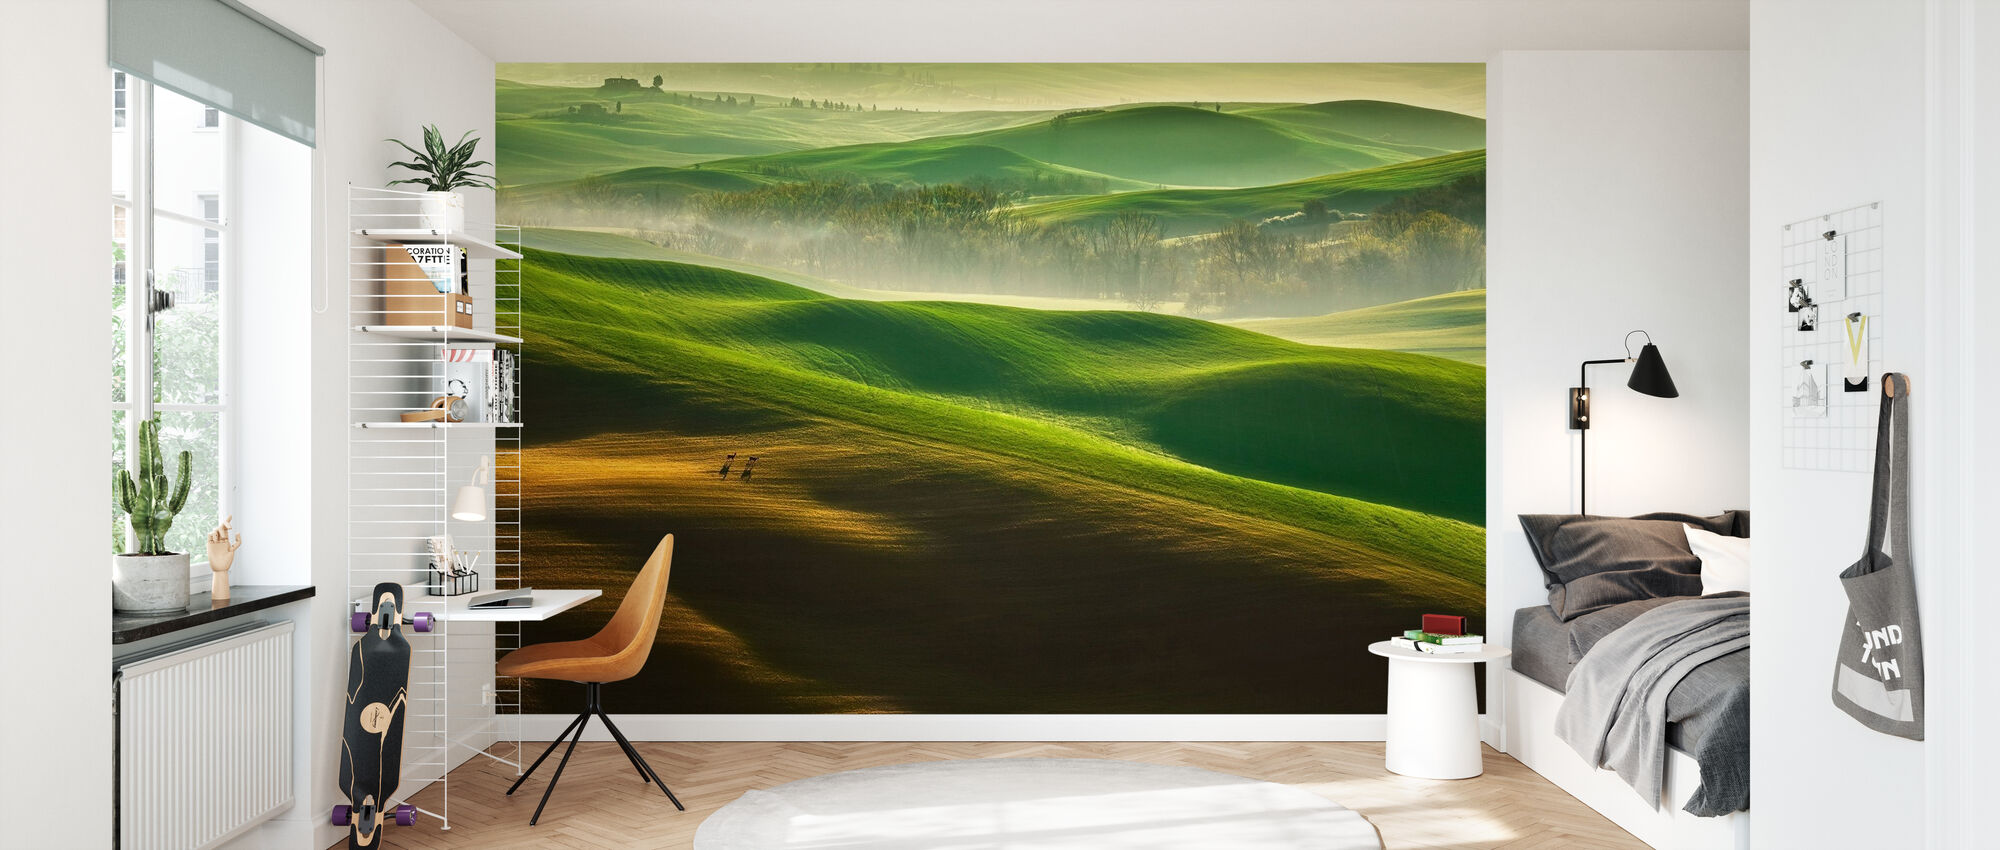 Freedom - Wallpaper - Kids Room